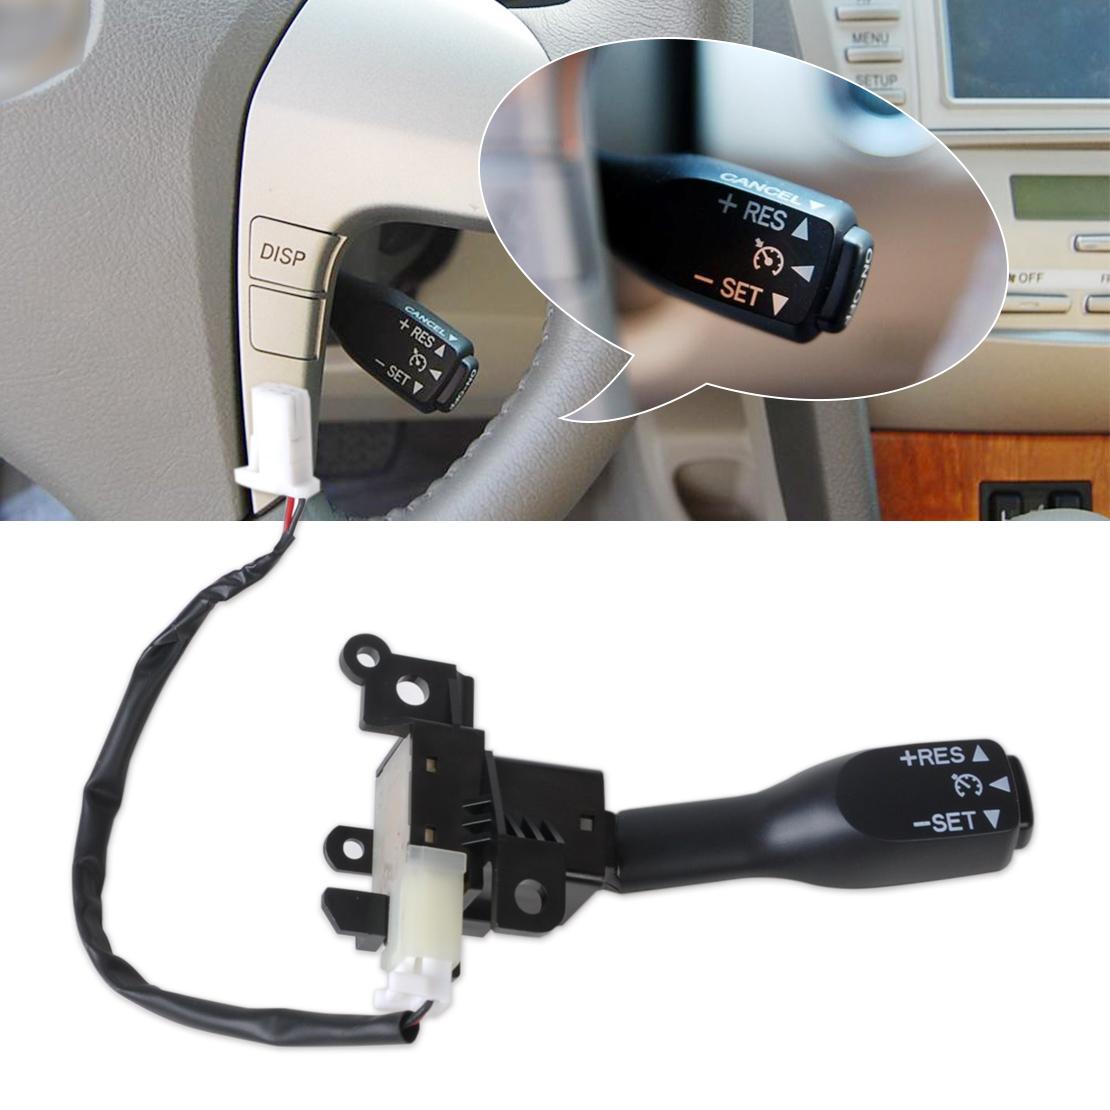 Cruise Control Switch For 4Runner Camry Yaris Matrix Corolla TC 84632-34011 Cruise Switch